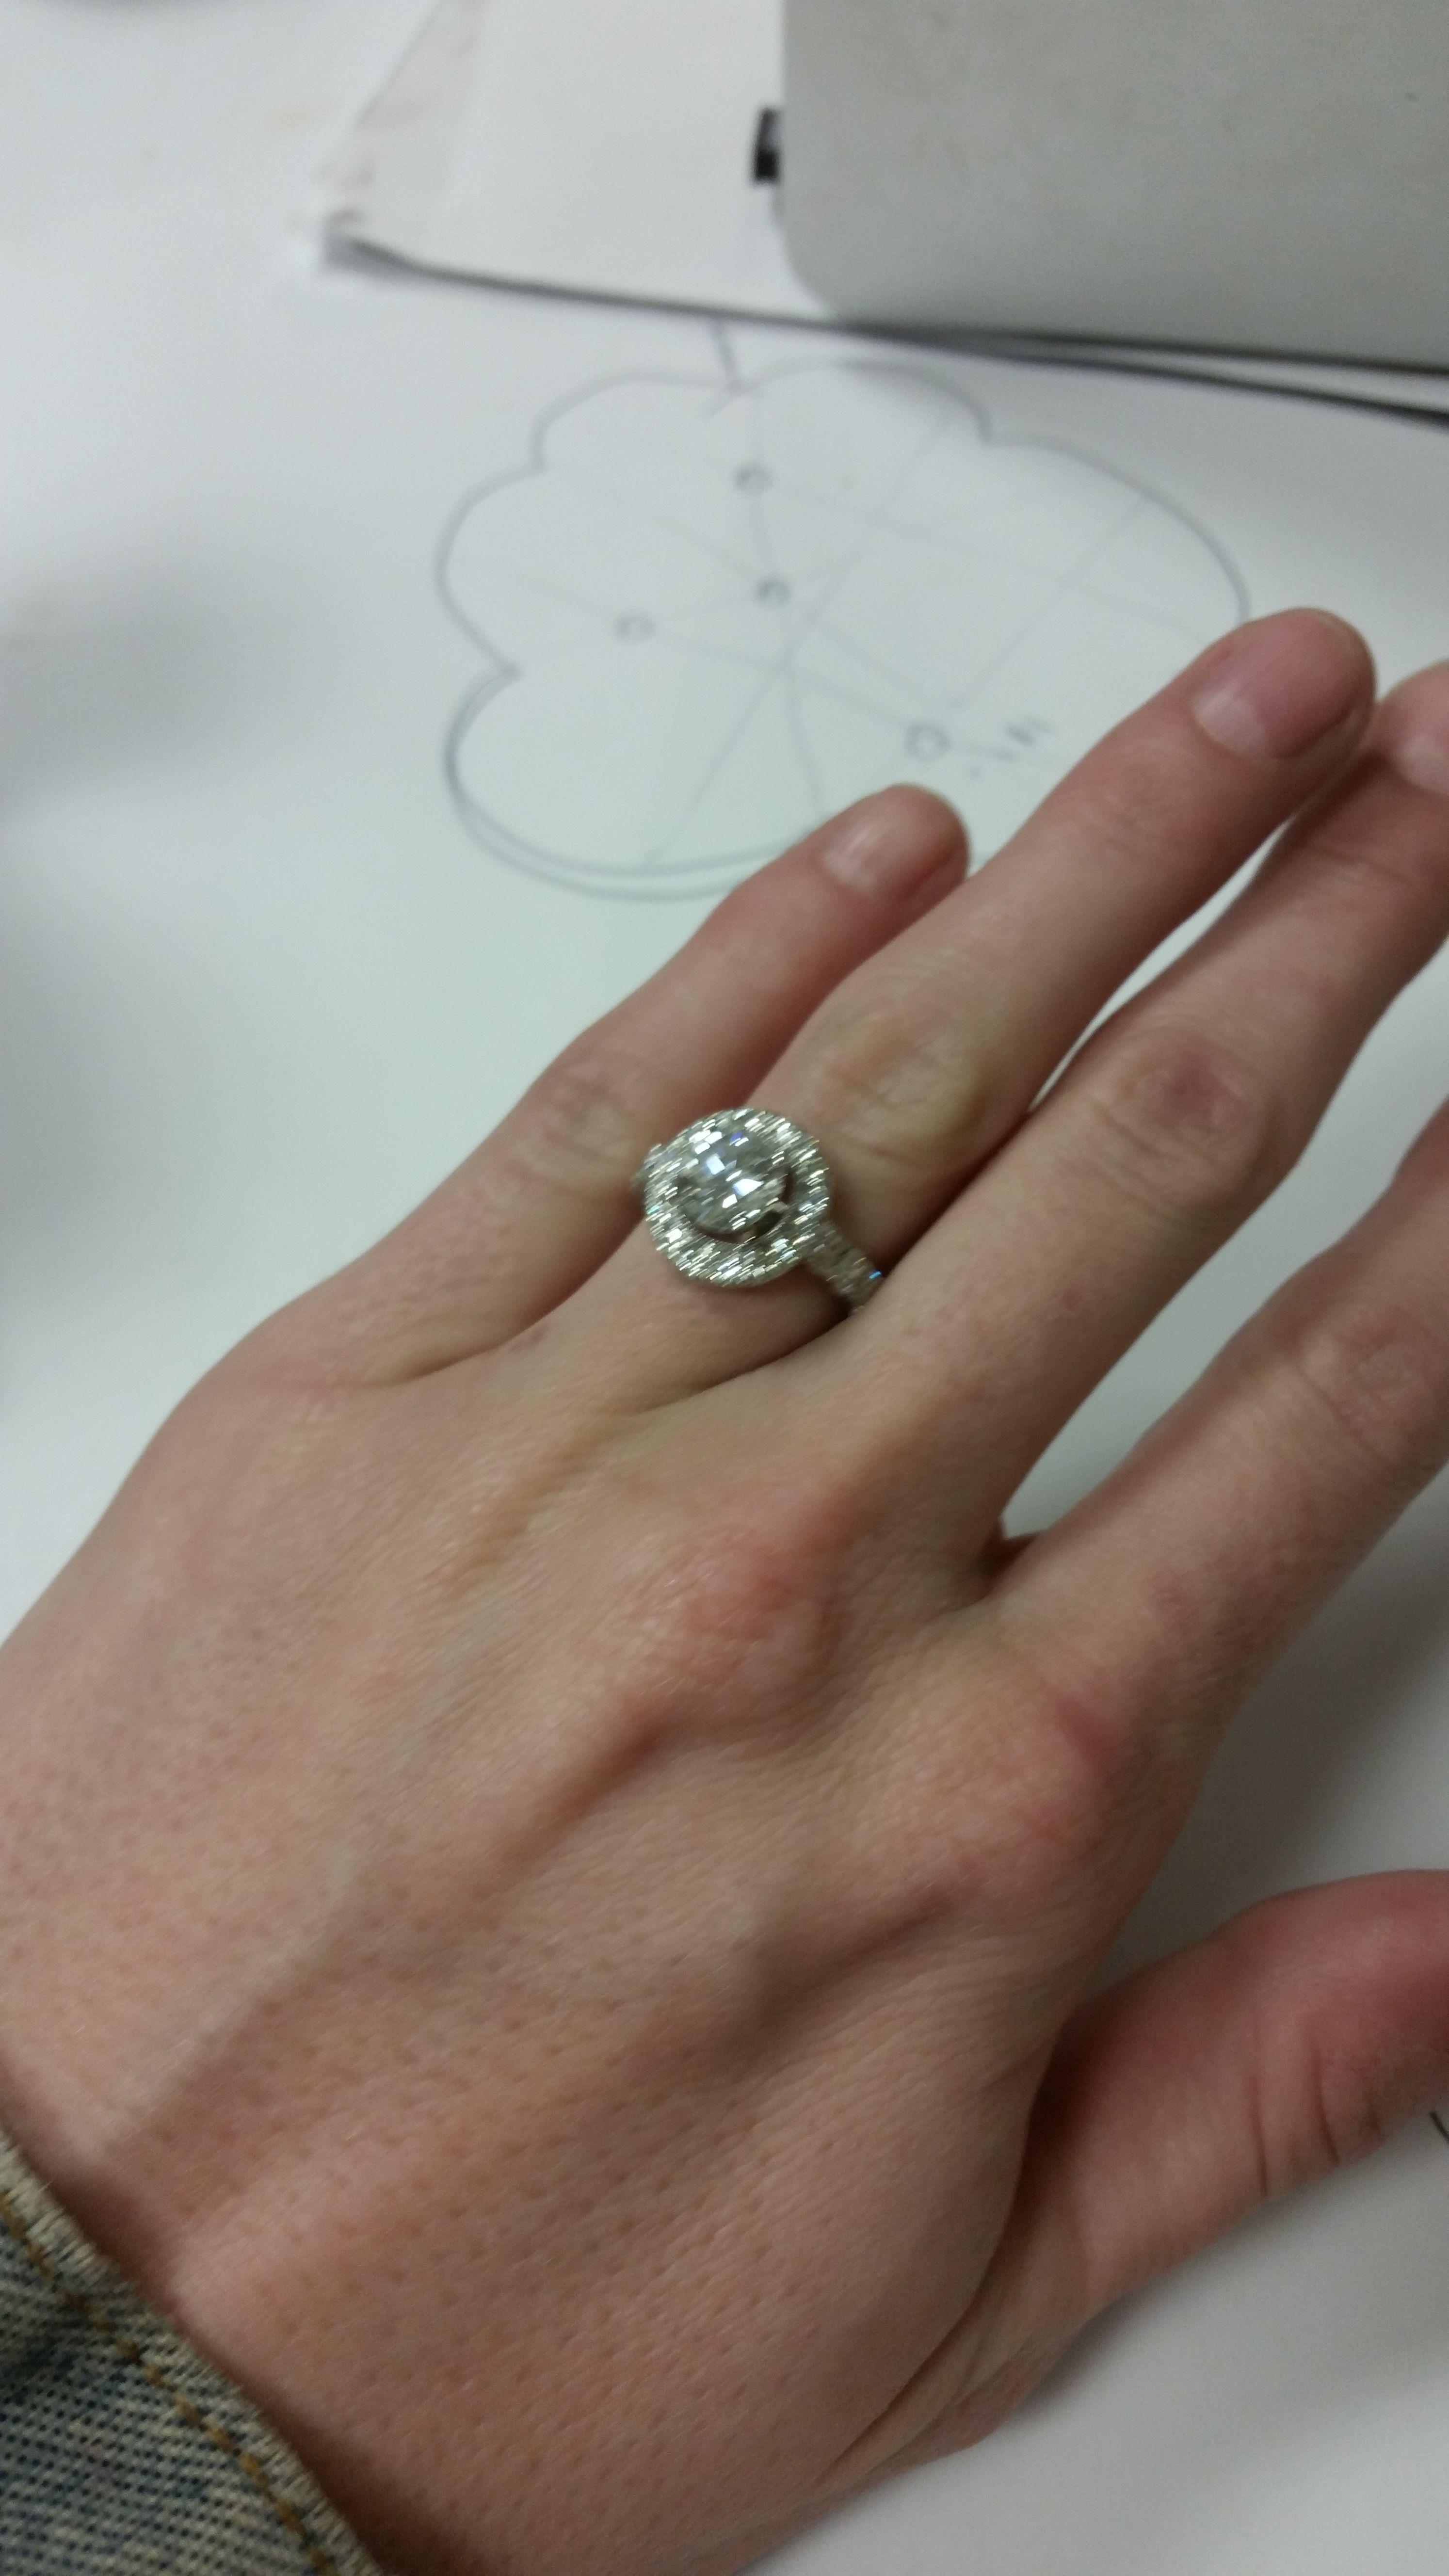 Custom Made Diamond Engagement Ring By Secrete Fine Jewelry In Dupont Circle Washington Dc Diamond Engagement Rings Engagement Rings Fine Jewelry